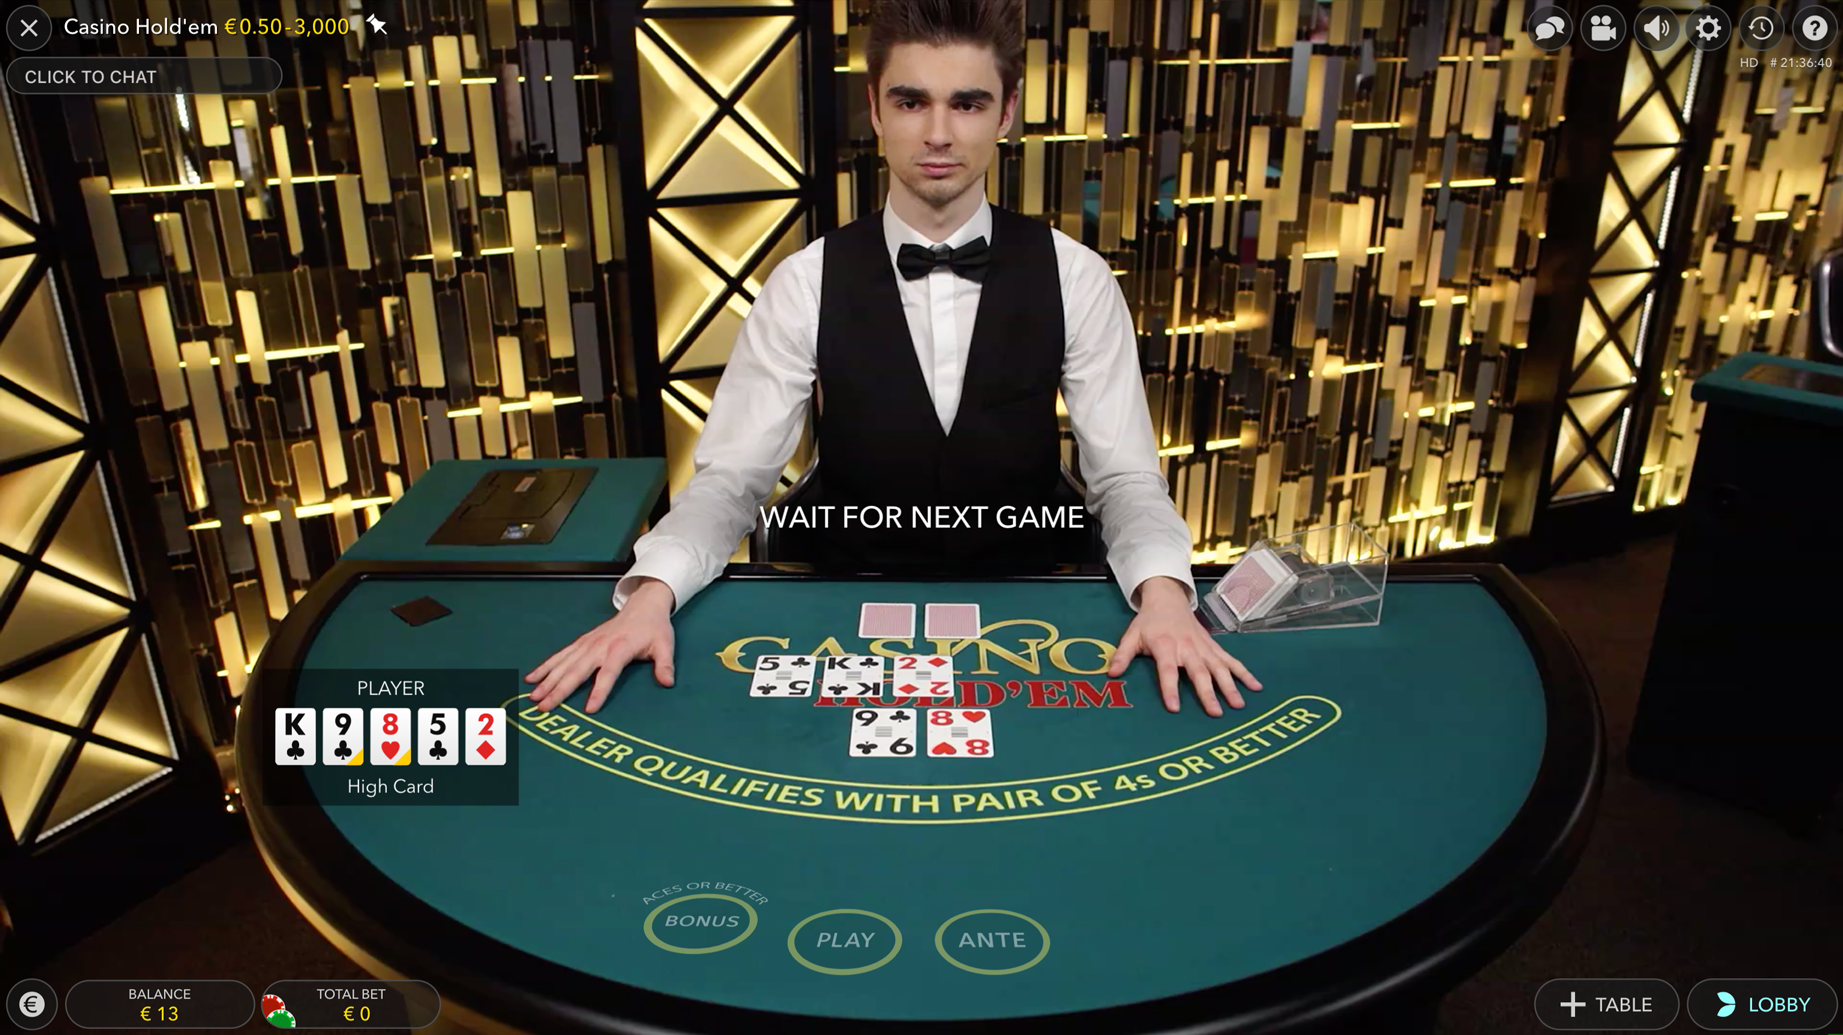 Онлайн казино холдем покер лак голден роз магнетик стар